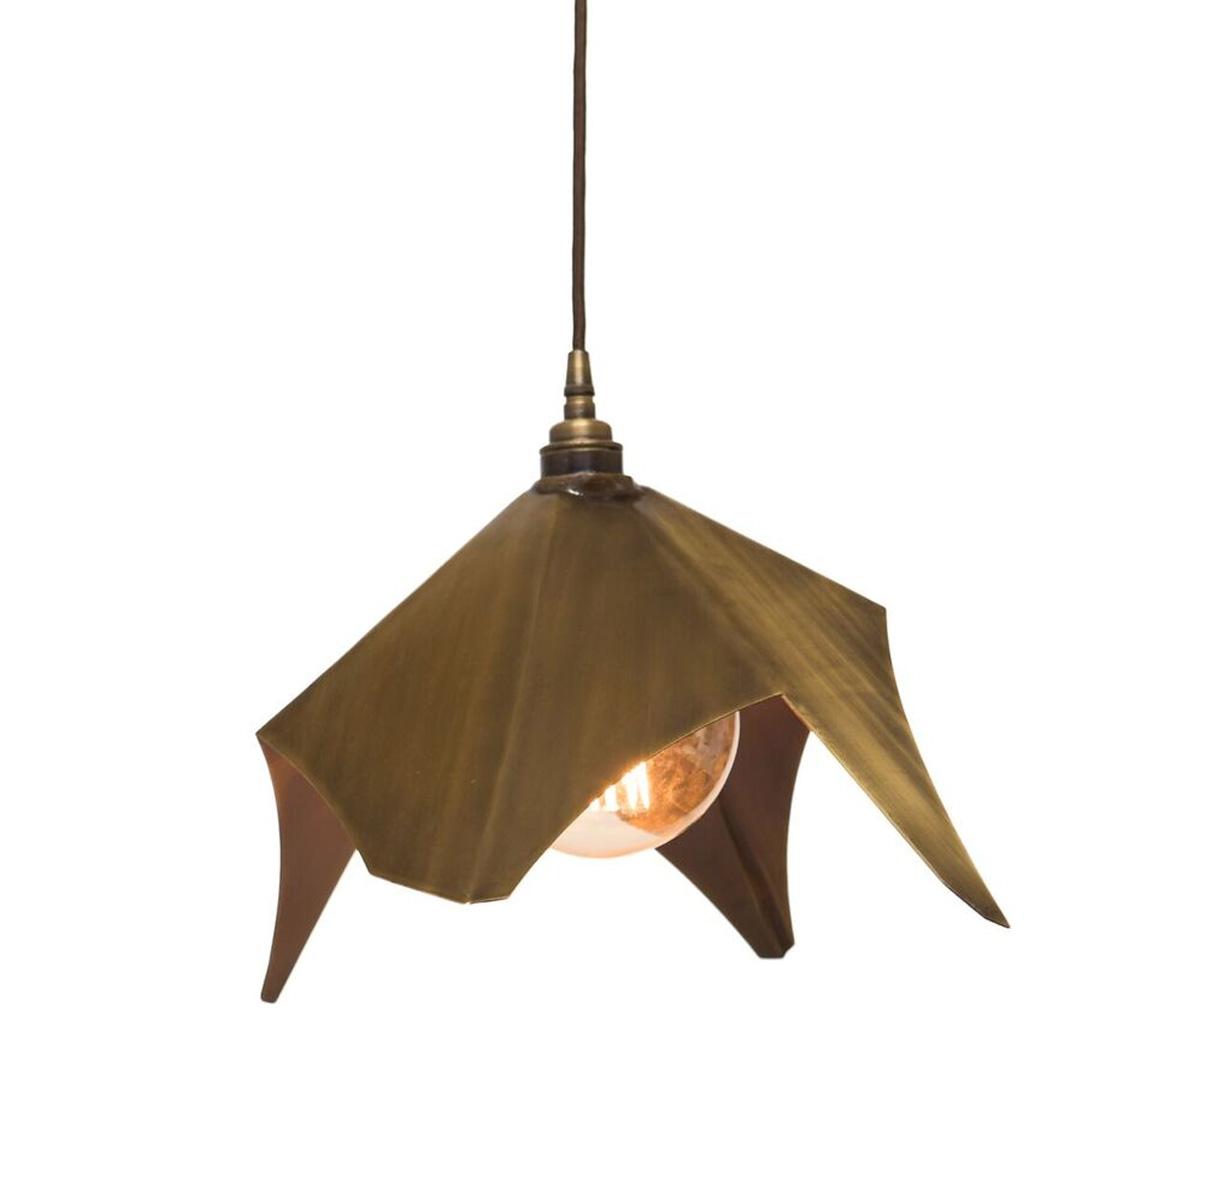 handmade lighting design. Arepo Pendant - Custom Handmade Lighting Murwyn Copper Design M